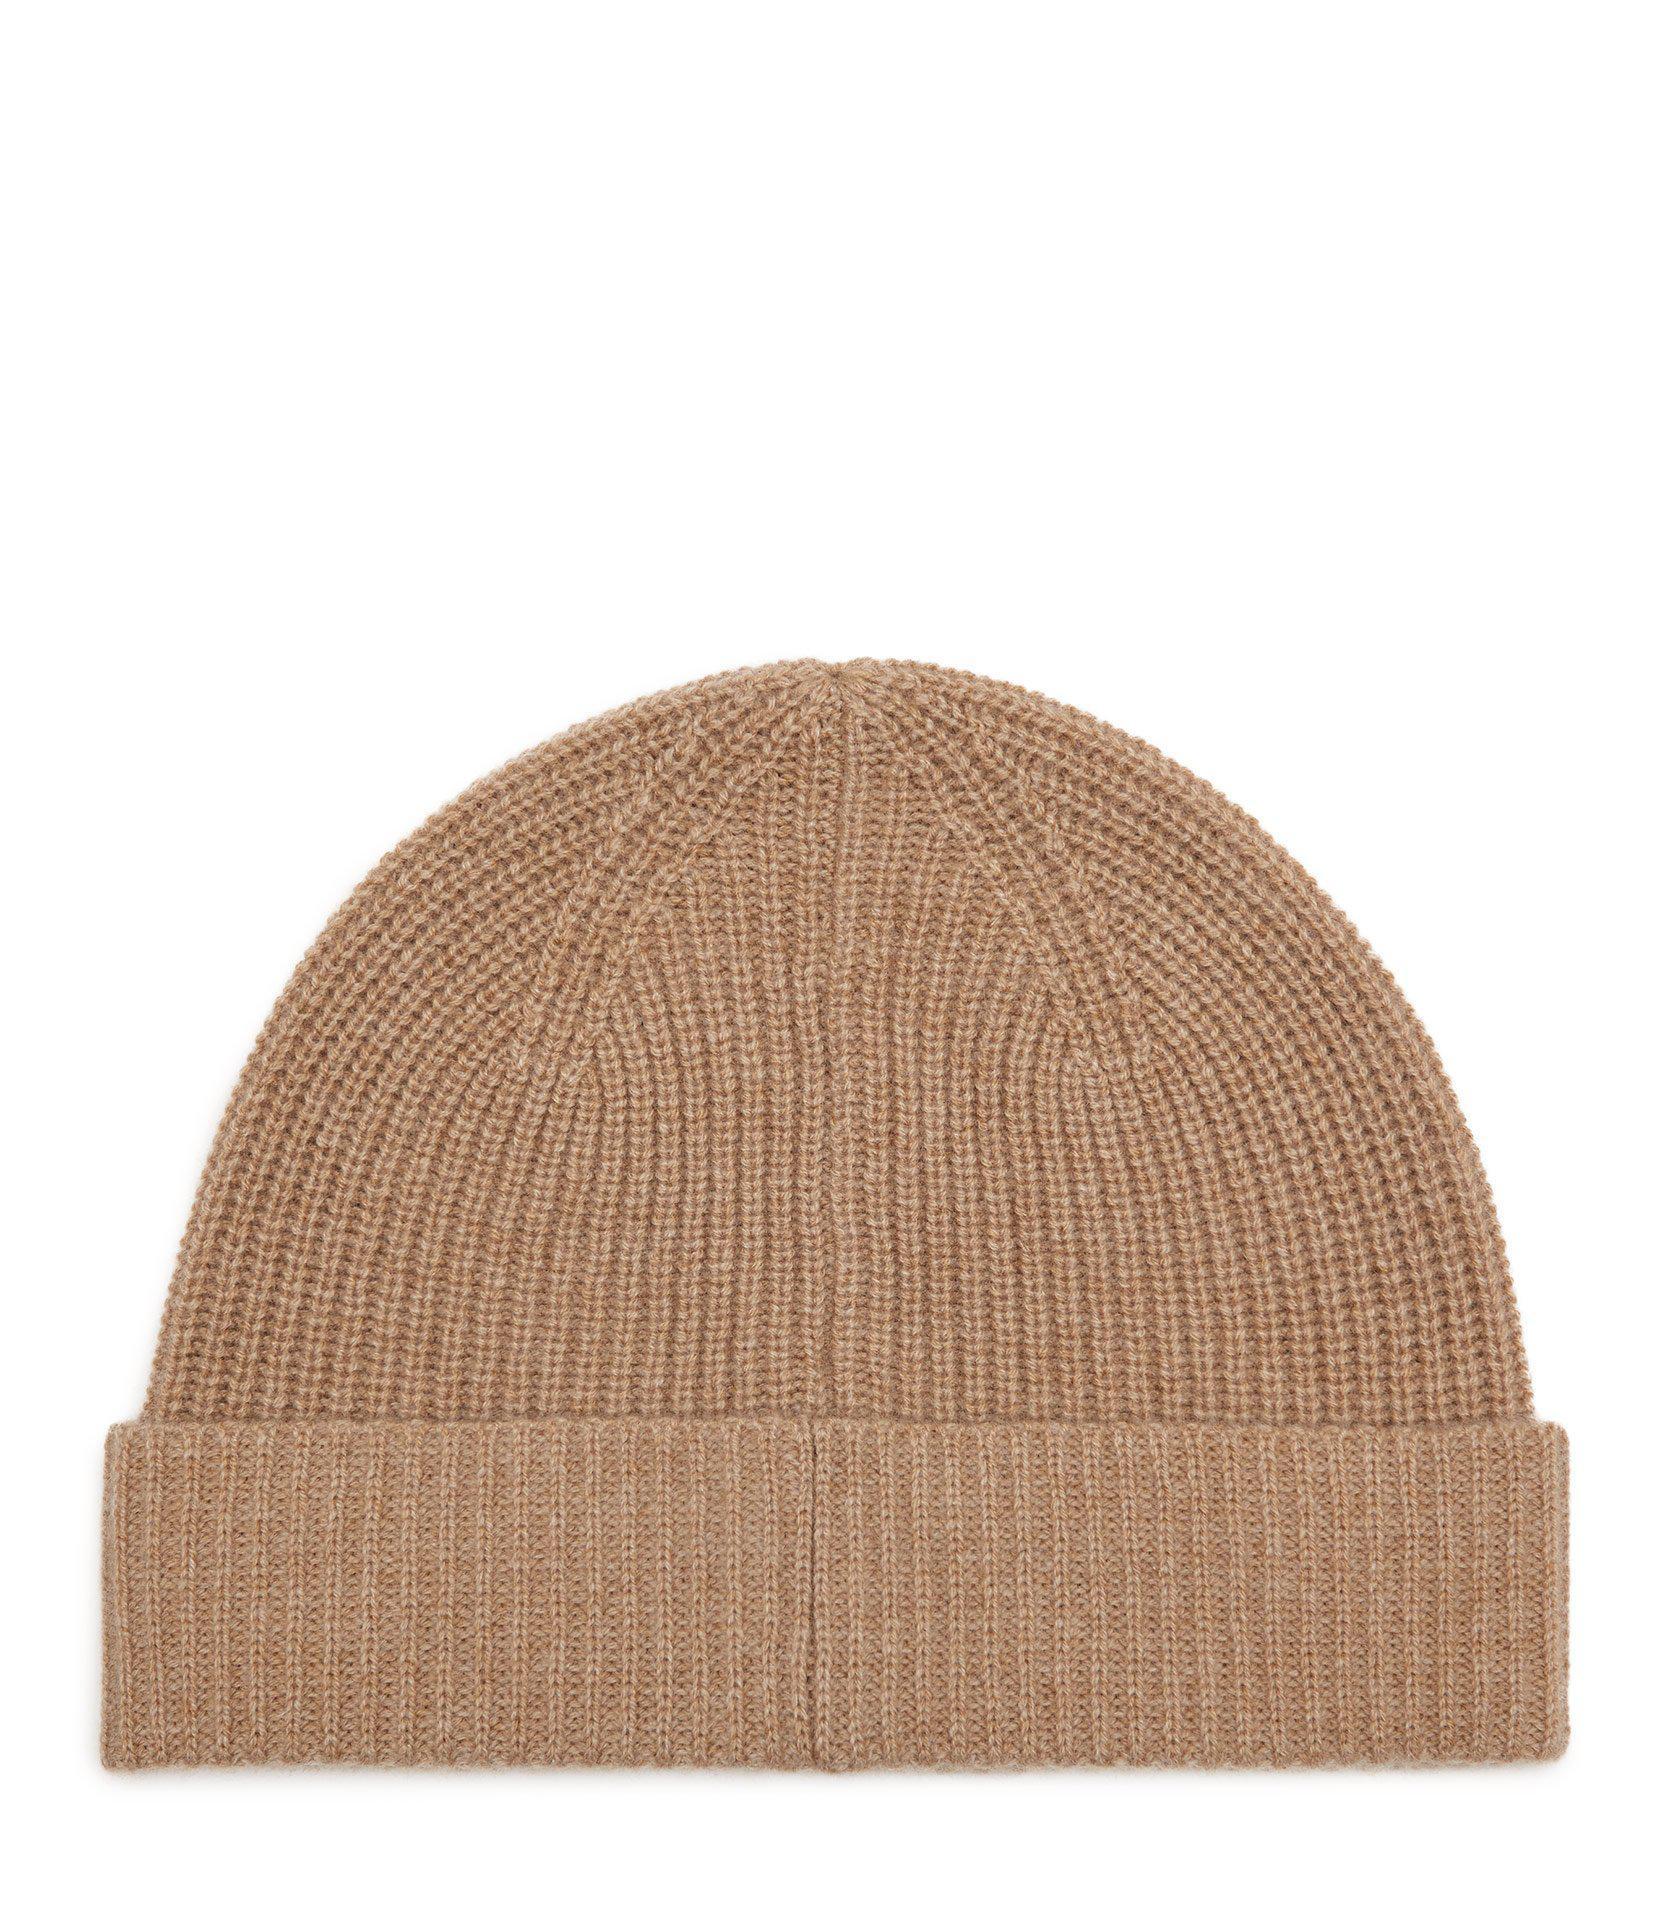 b58c50db3a1 Reiss. Women s Emmerson Hat